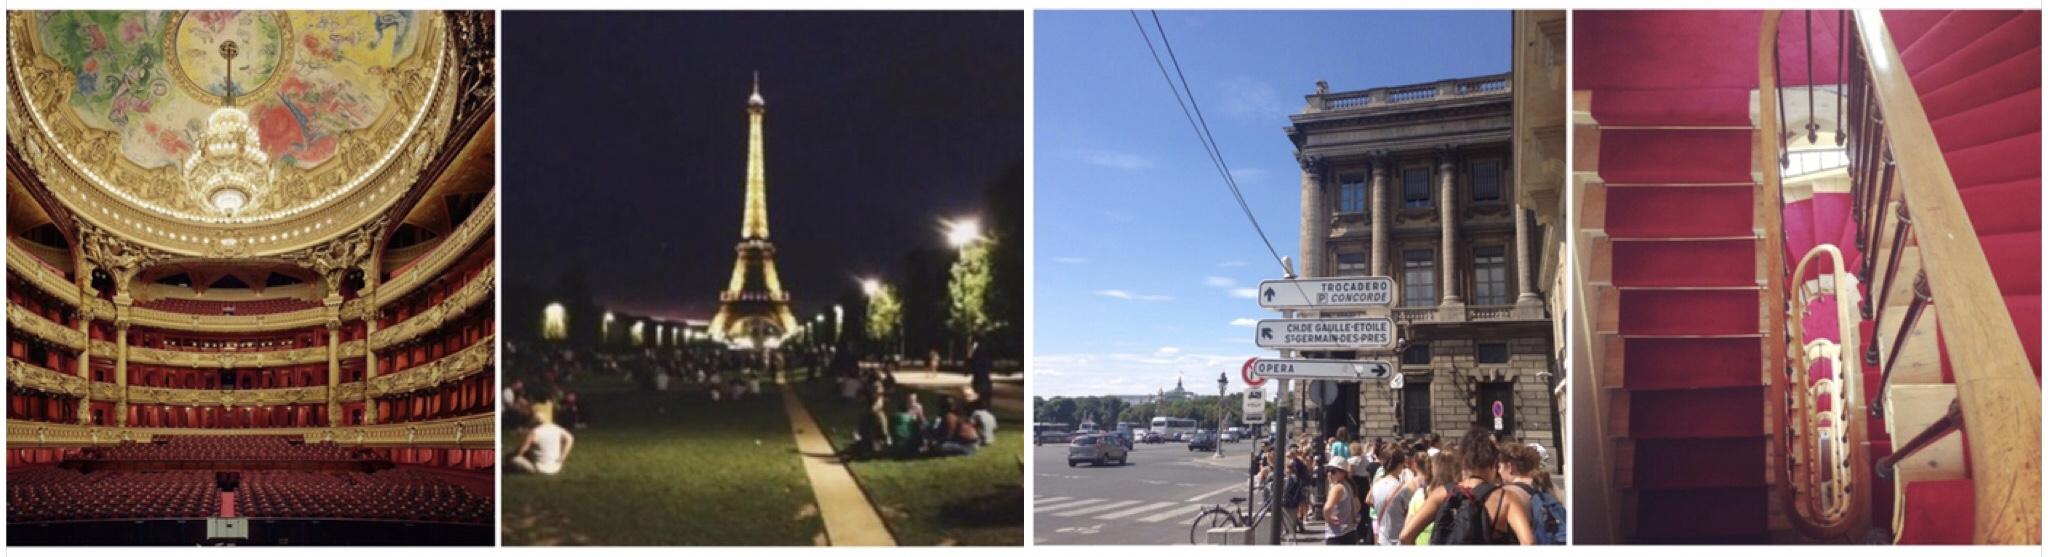 Paris Extra